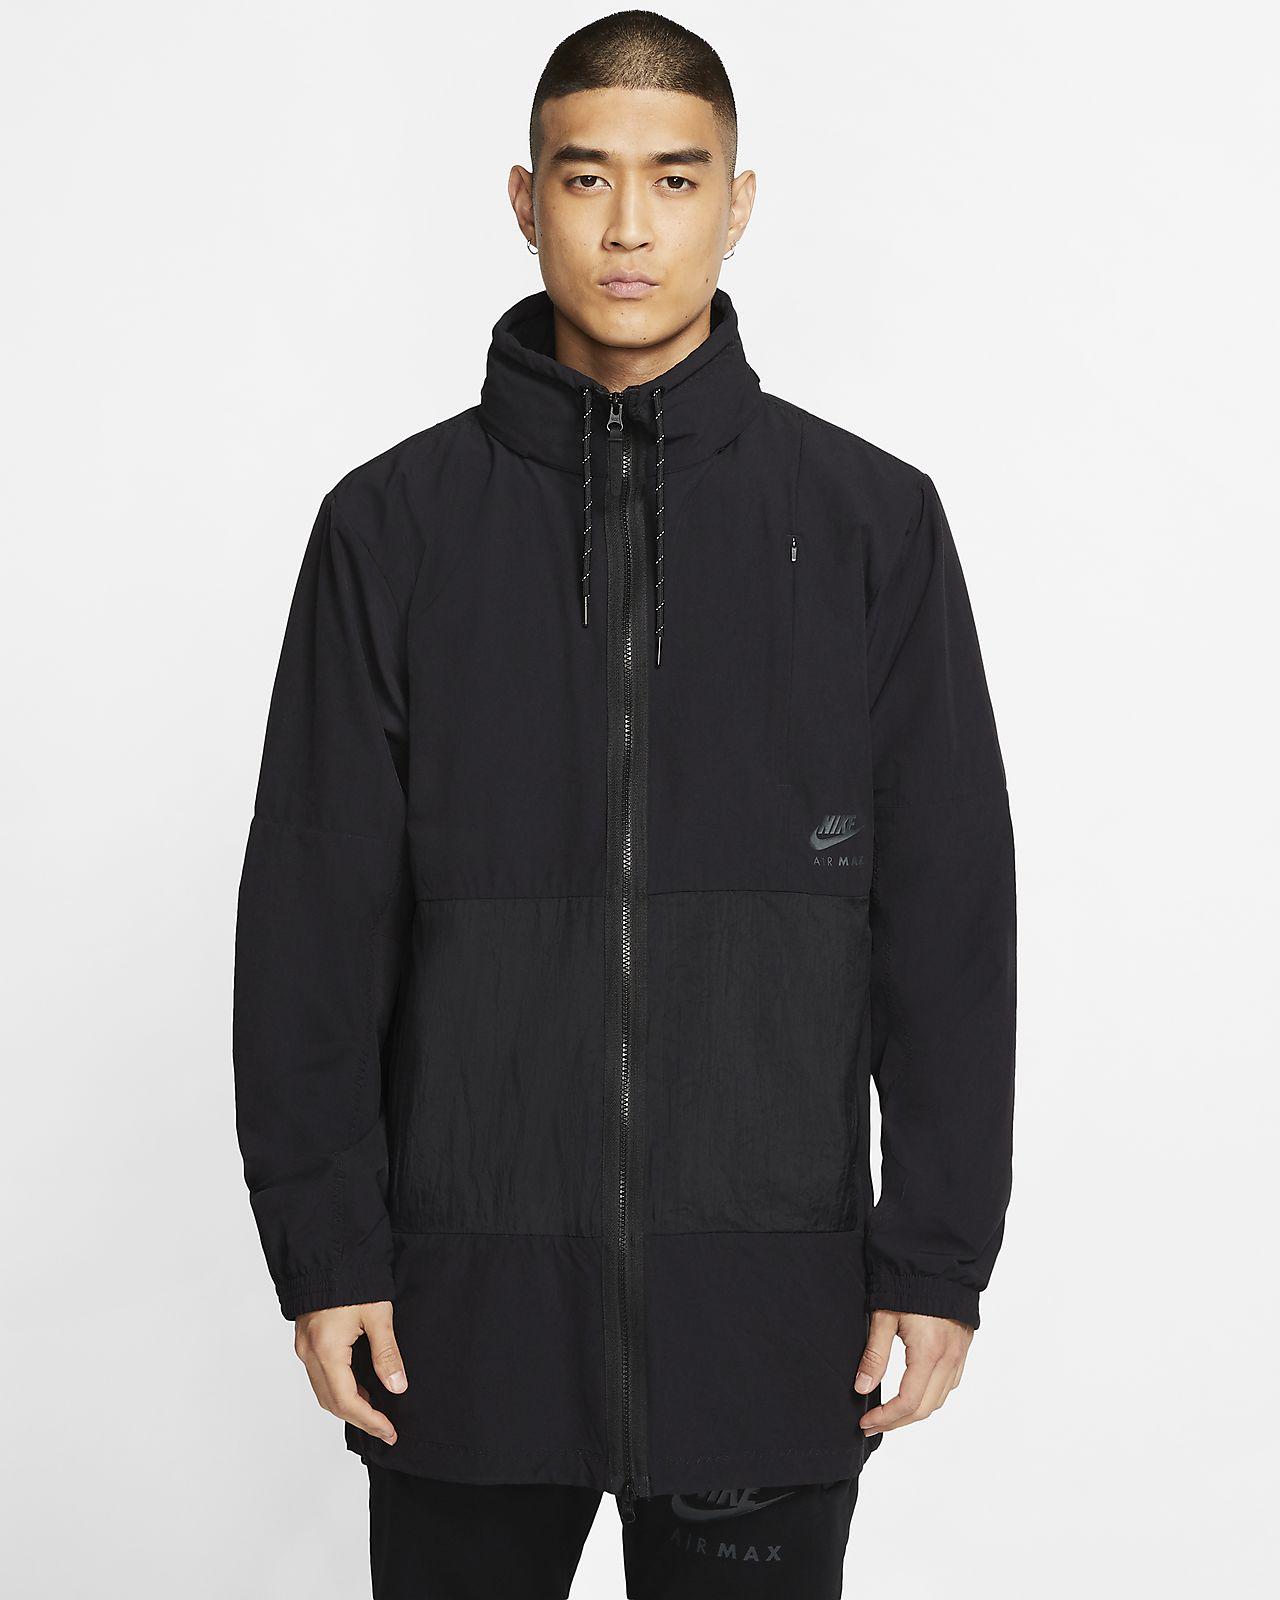 Jacka Nike Sportswear Air Max Woven för män. Nike SE